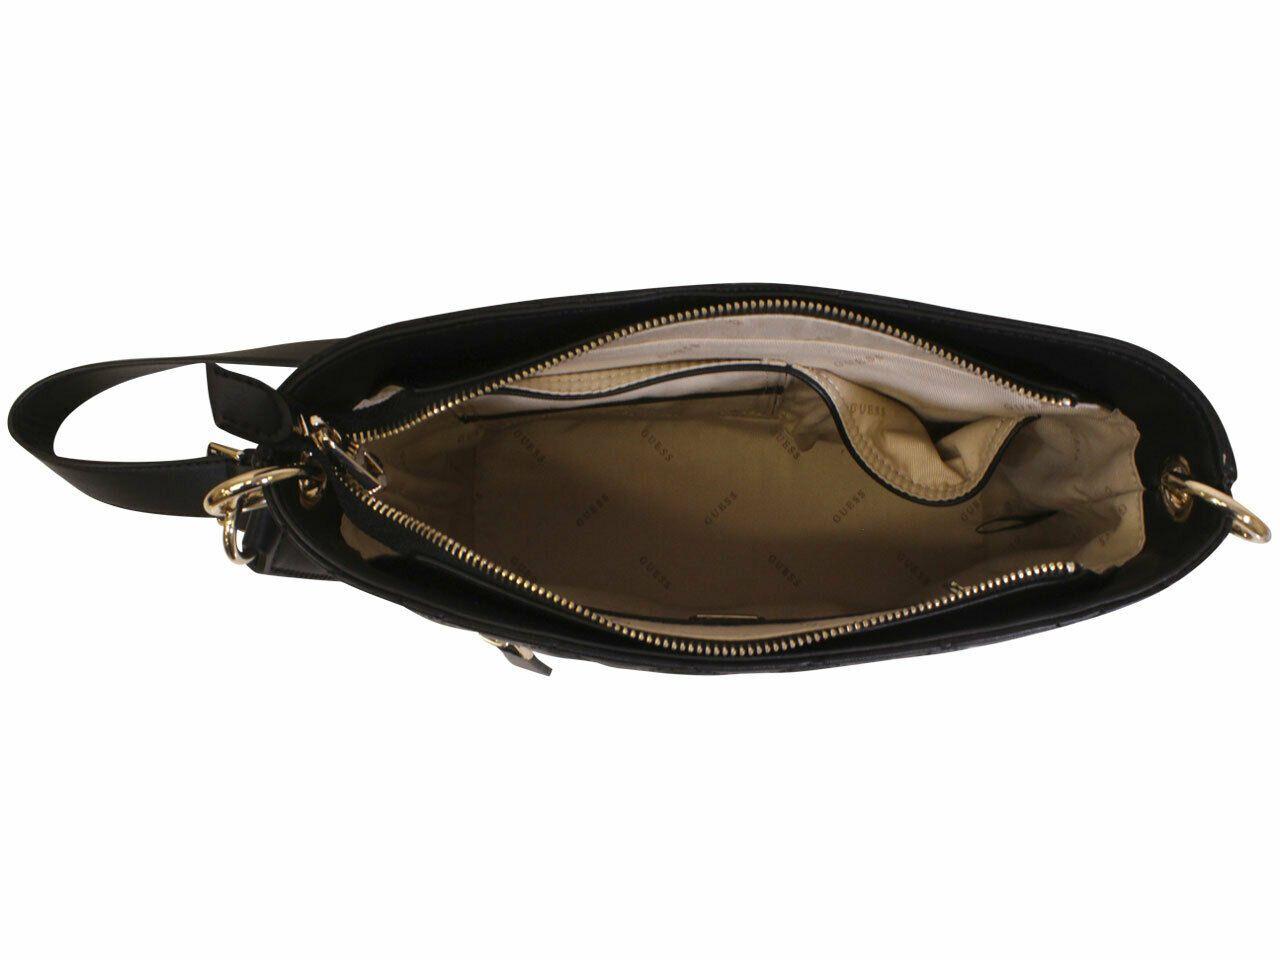 Guess Γυναικεία τσάντα bucket Illy VG797001